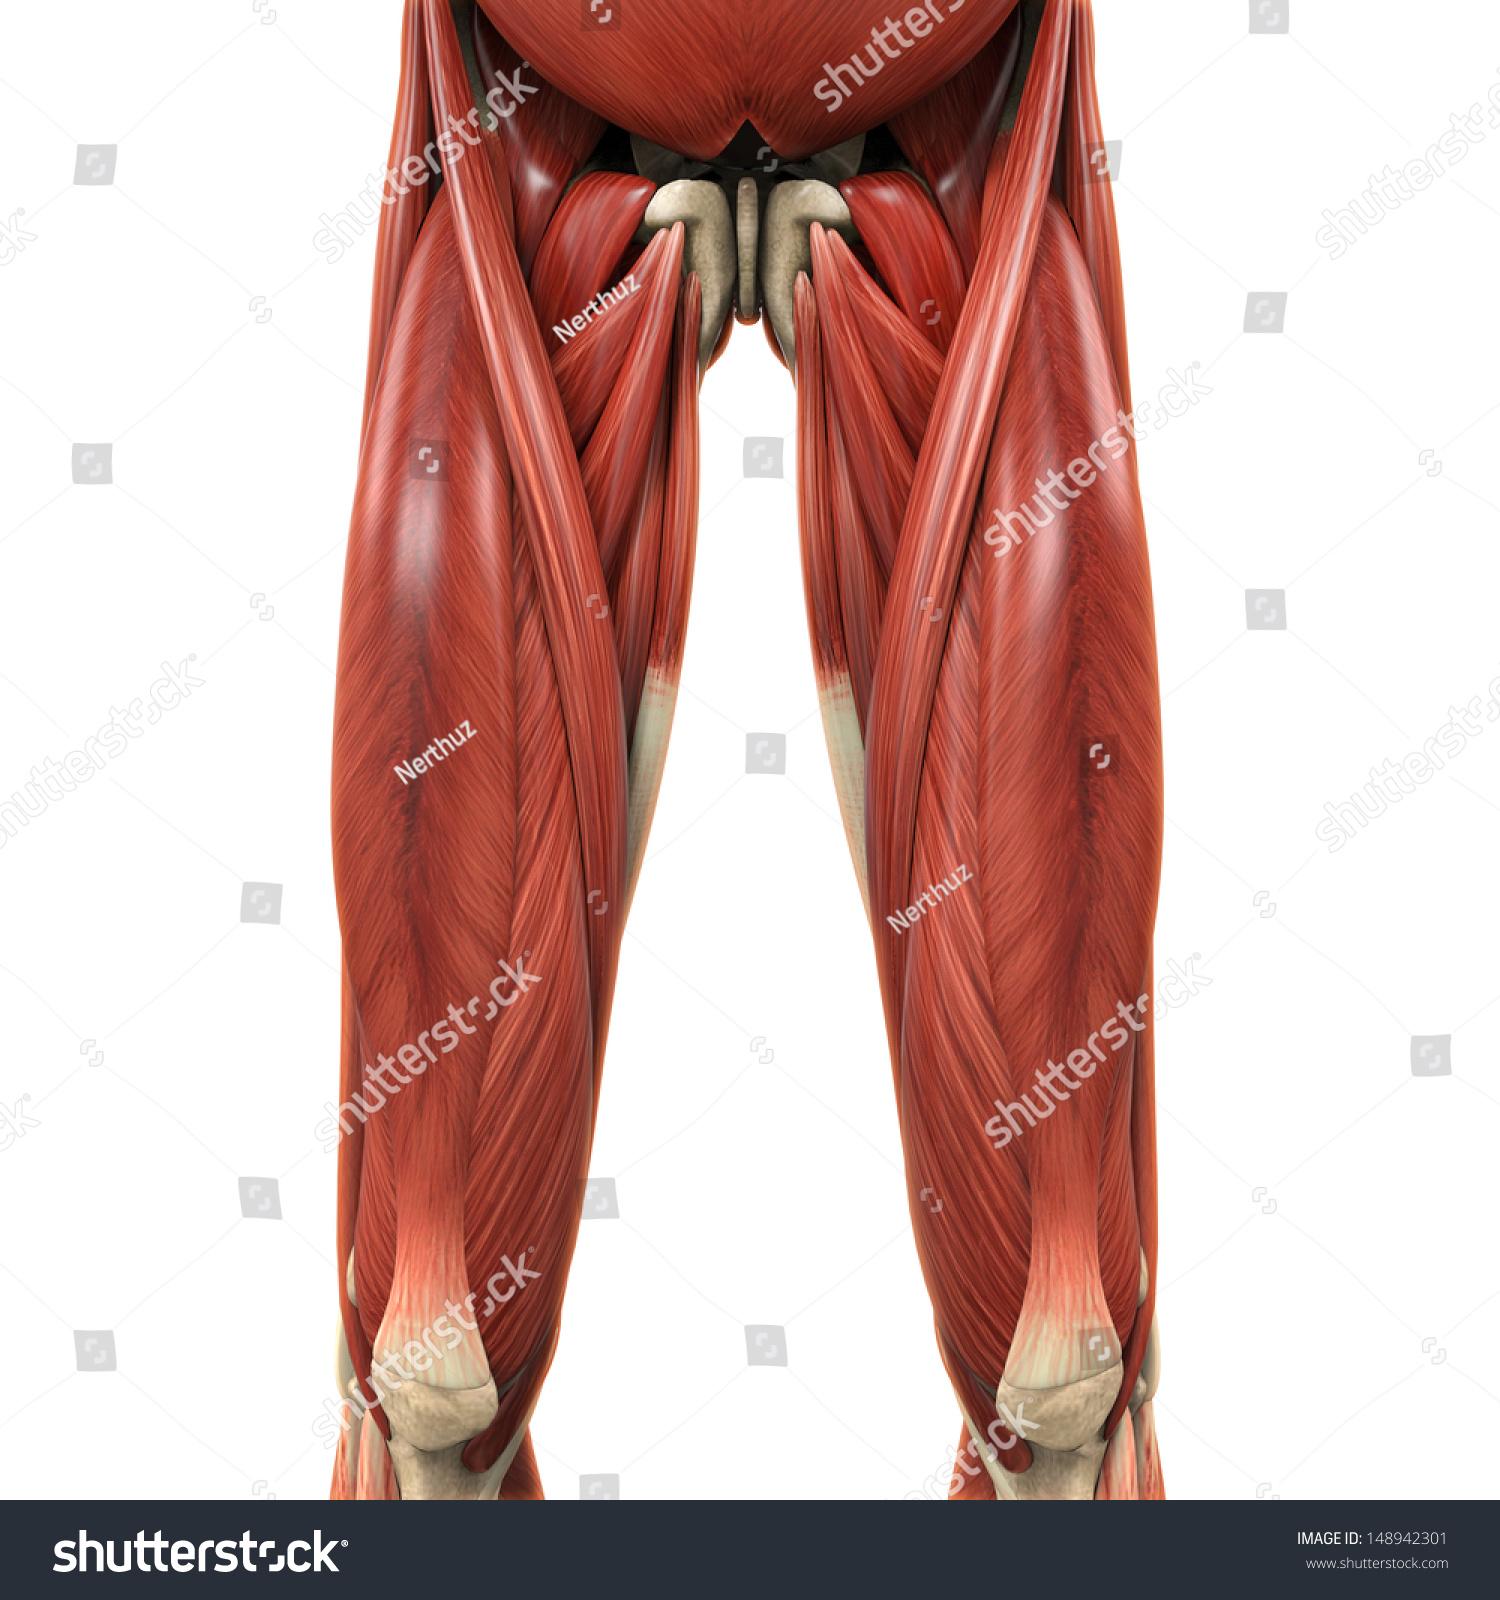 Upper Legs Muscles Anatomy Stock Illustration 148942301 - Shutterstock